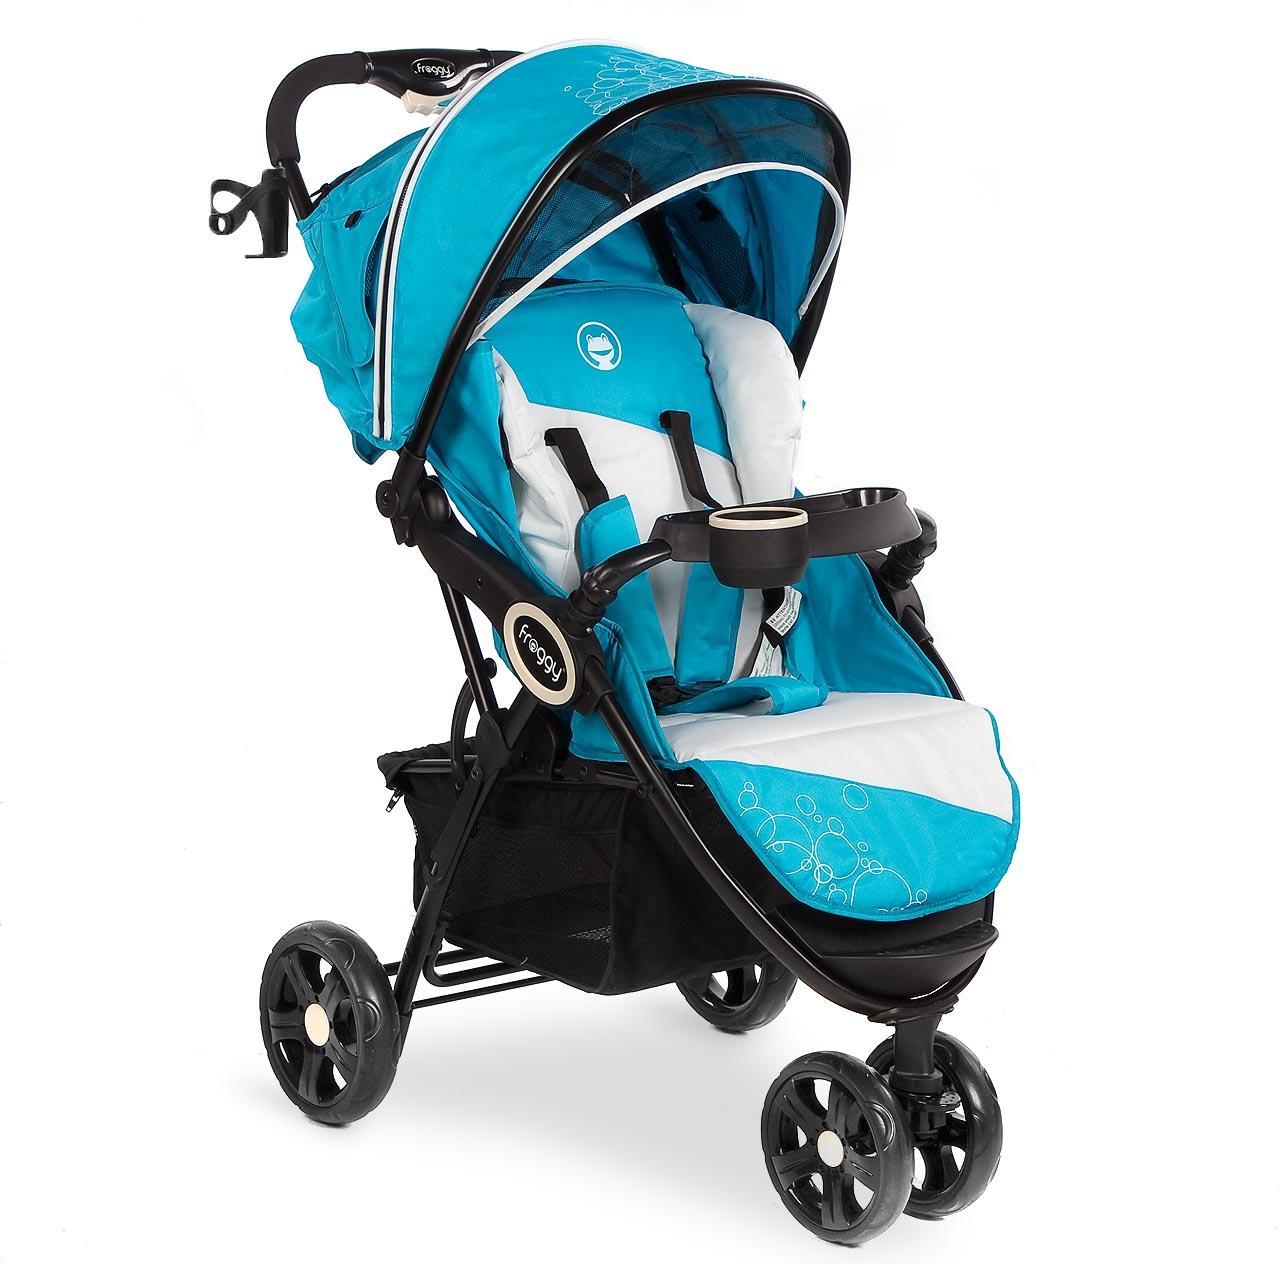 froggy kinderwagen dingo buggy sportwagen kinder babywagen 3 rad farbauswahl. Black Bedroom Furniture Sets. Home Design Ideas